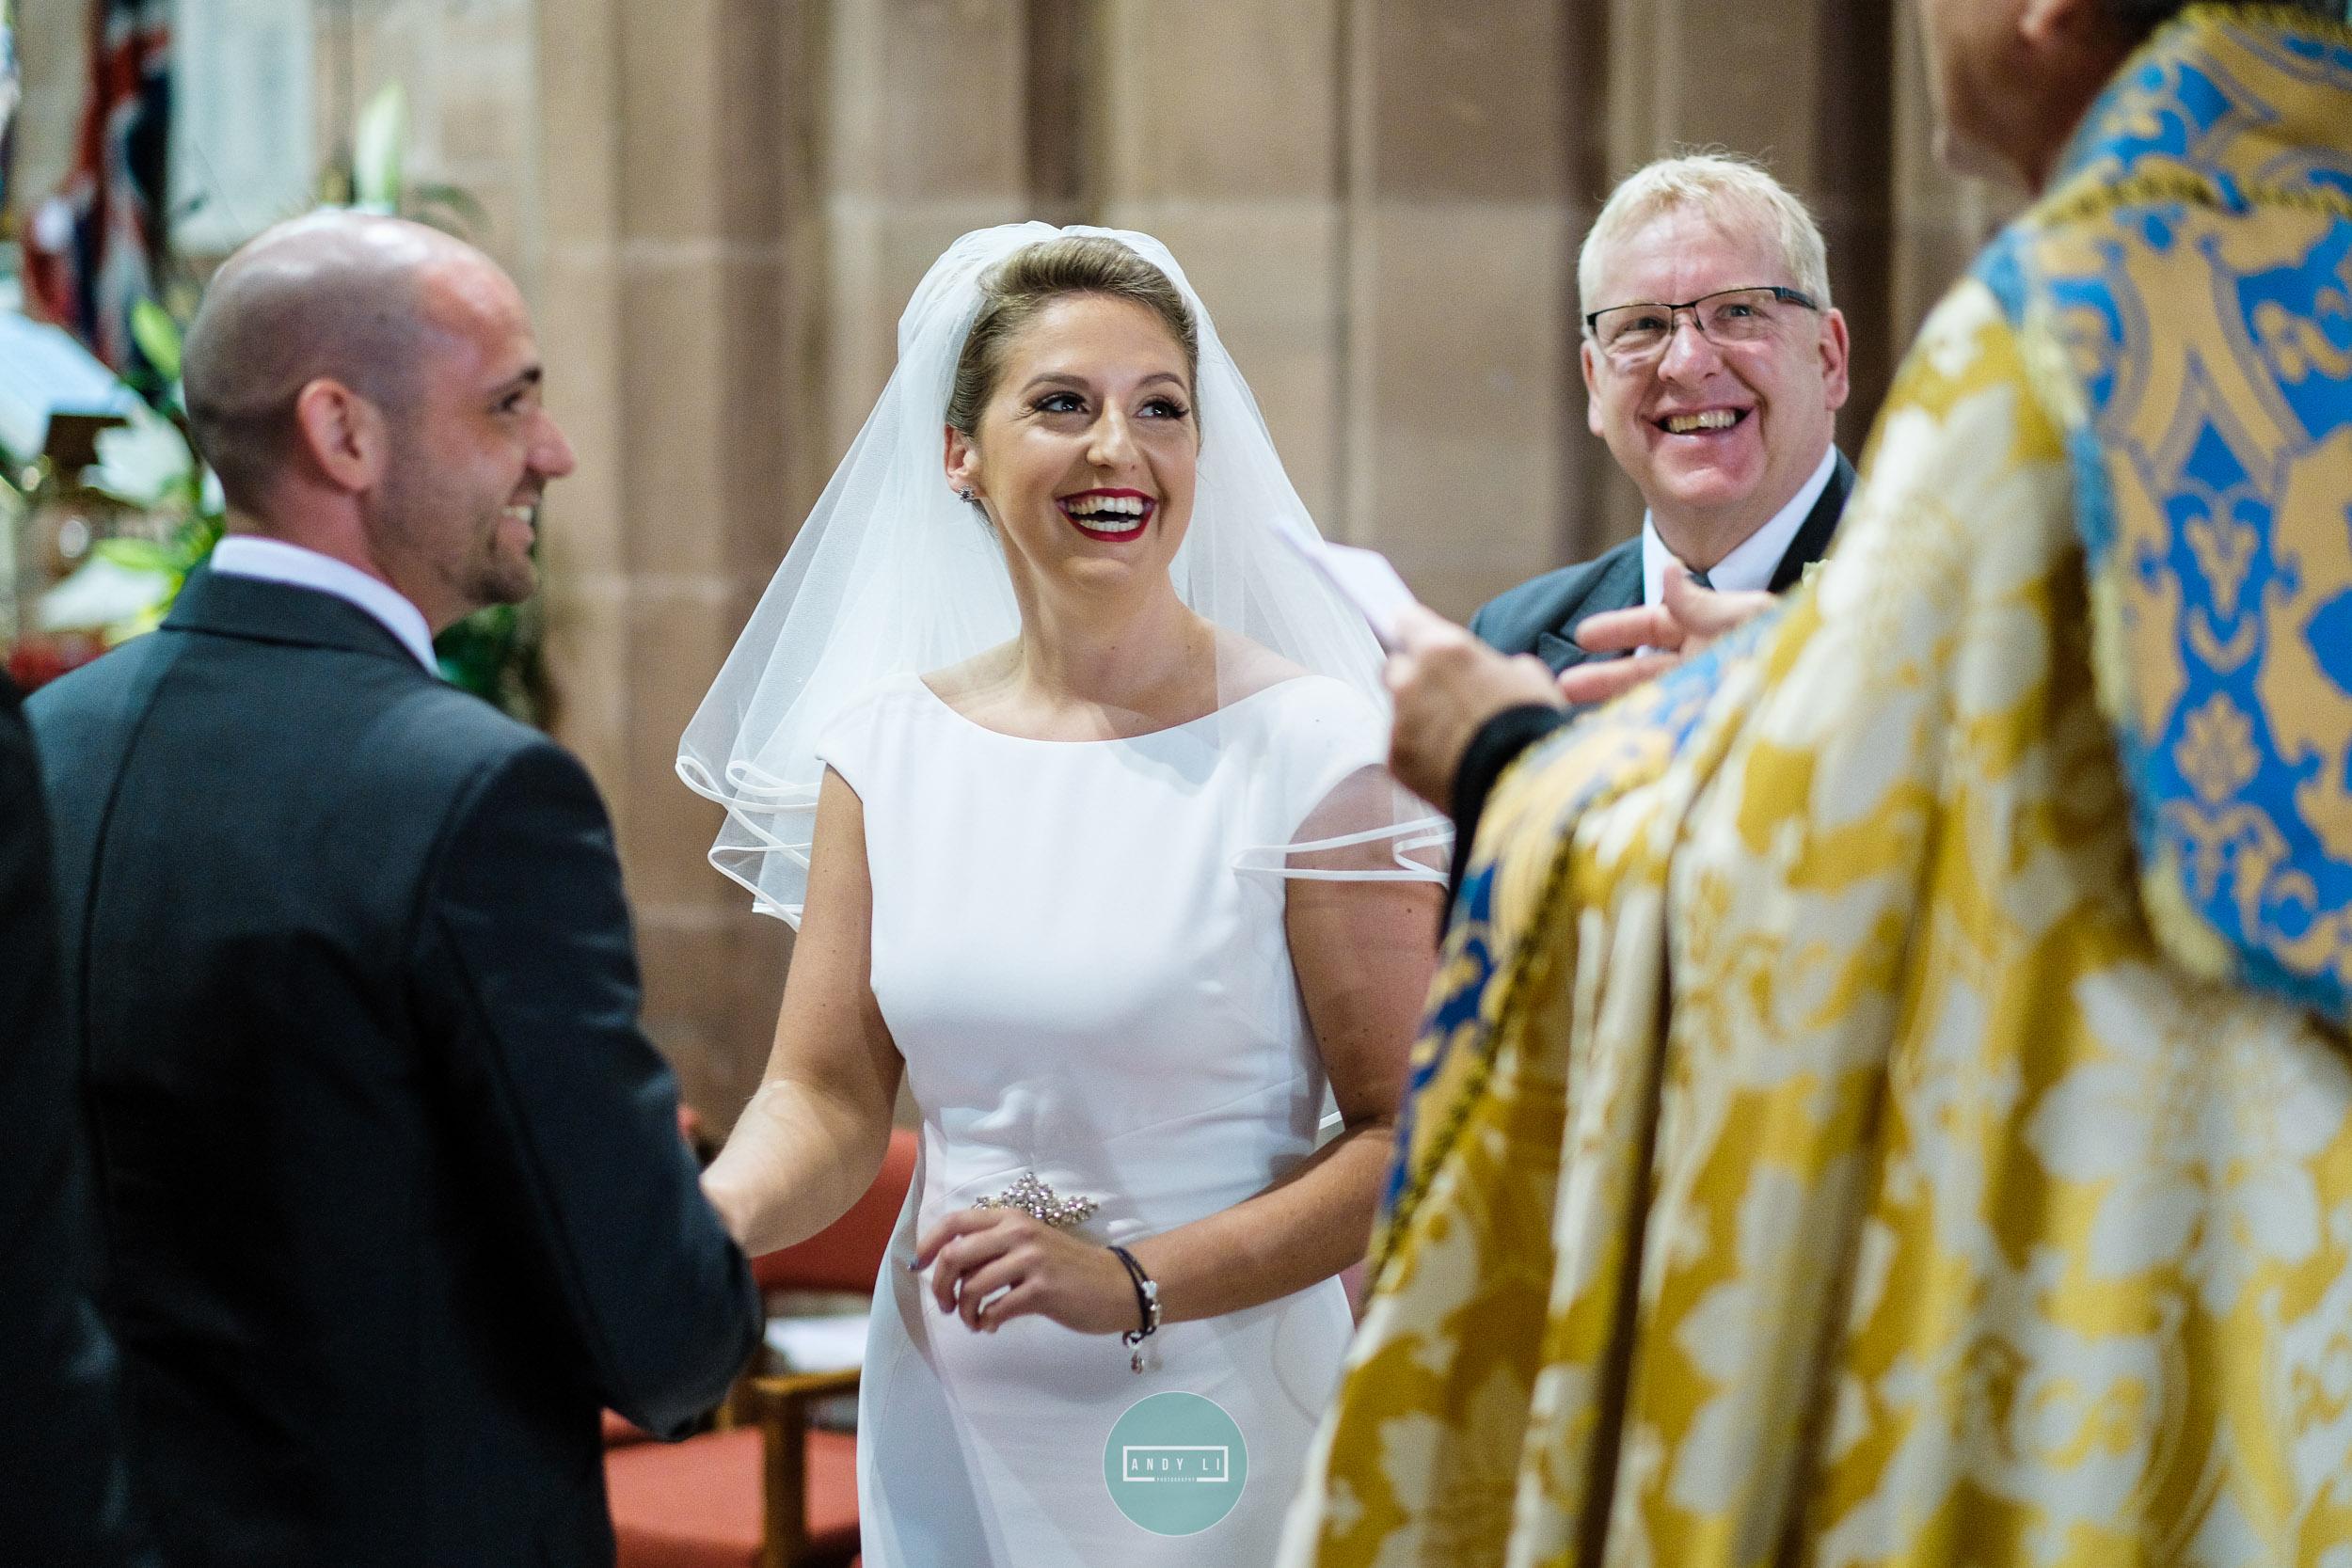 Lilleshall Hall Wedding Photographer-029-AXT21600.jpg